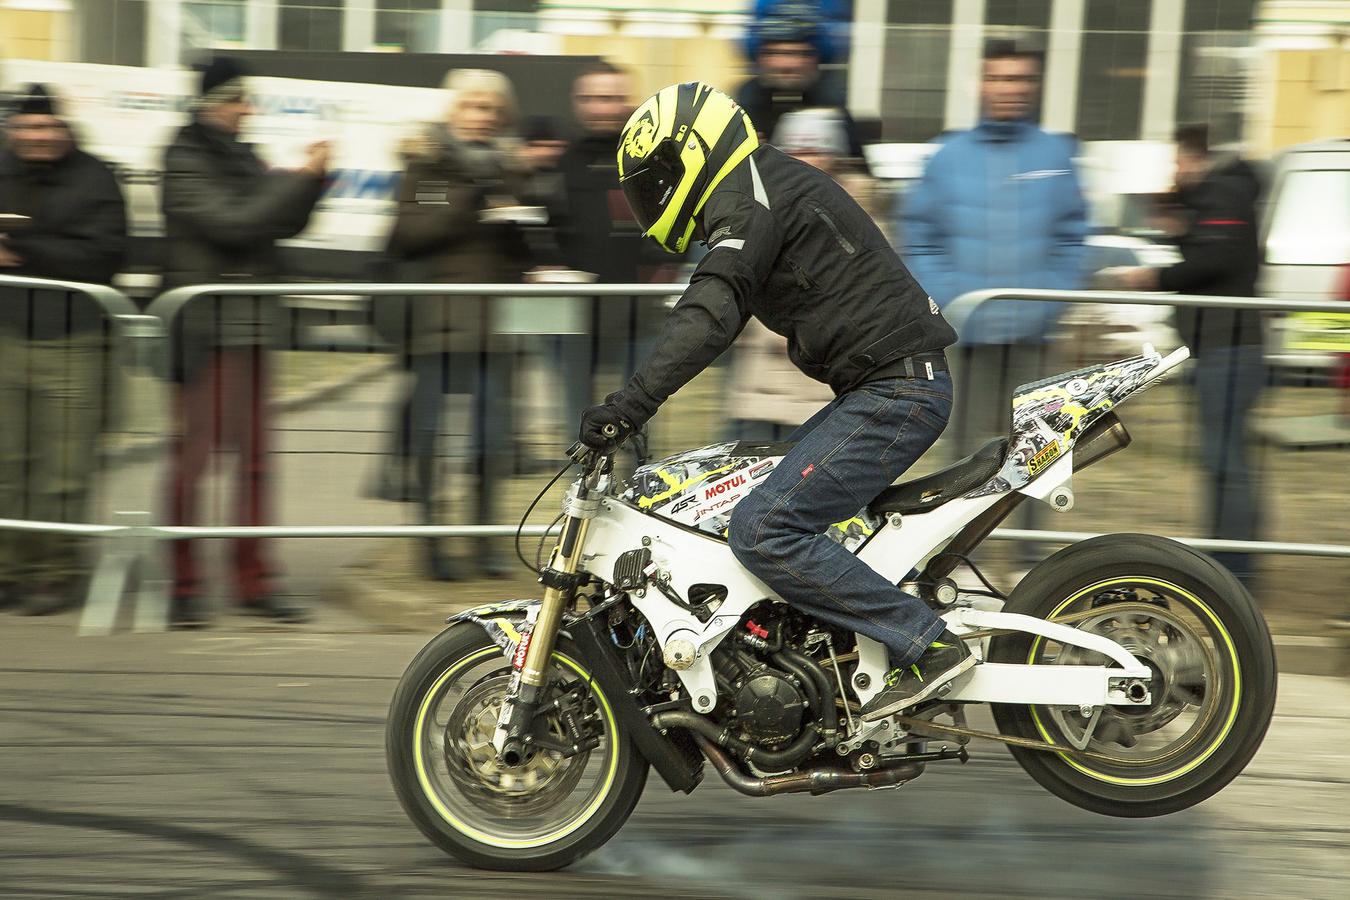 Motocykl 2018 č. 2